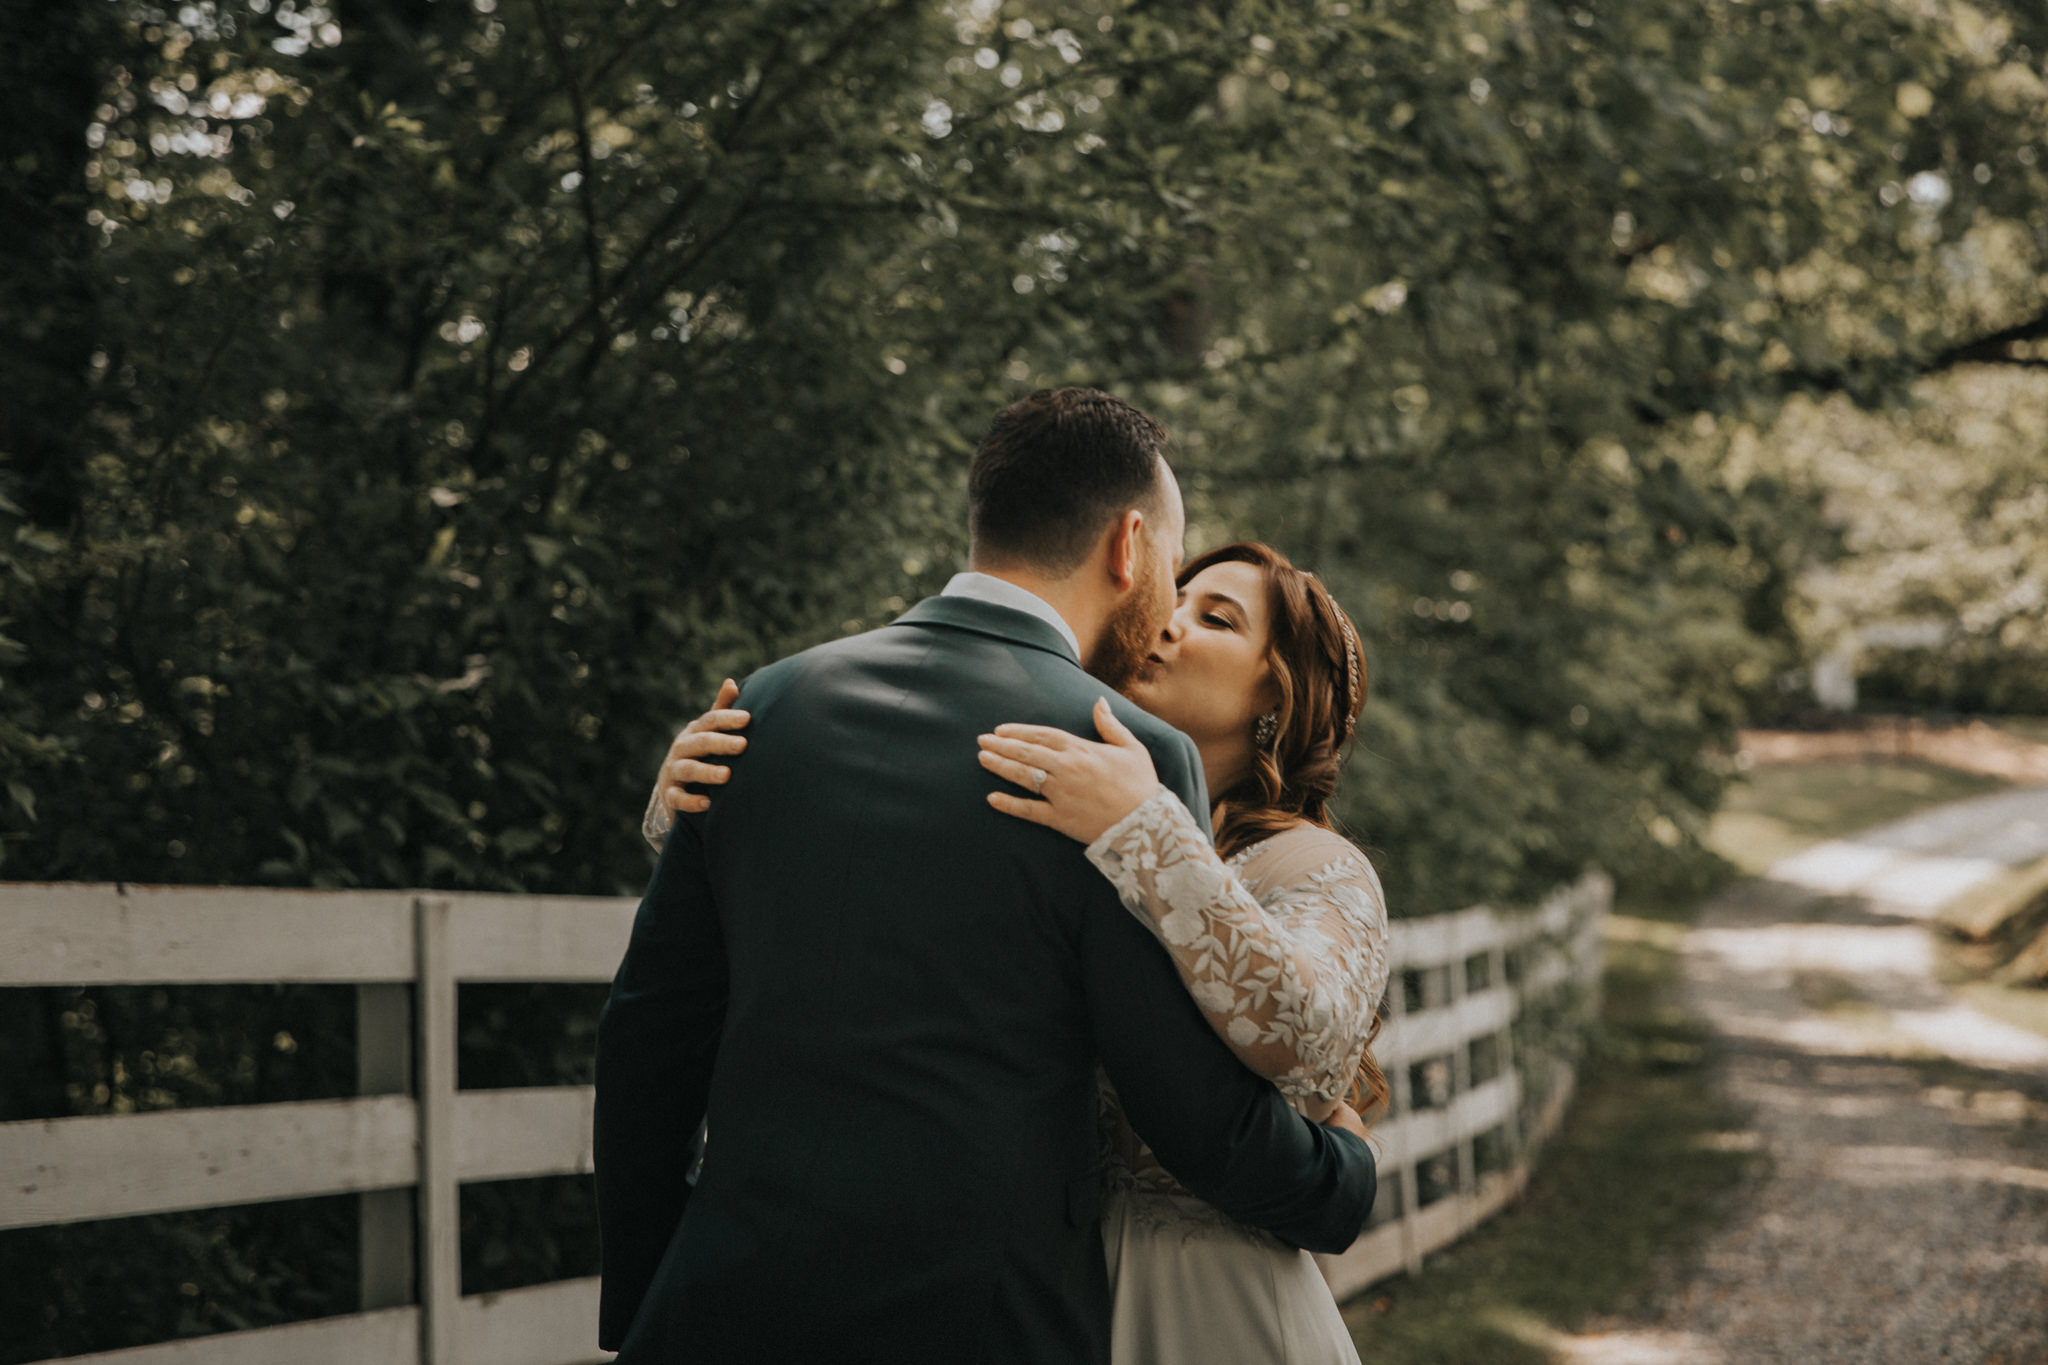 KateMatt-North-Georgia-Wedding-Photographer-Mountain-Laurel-Farm-43.jpg